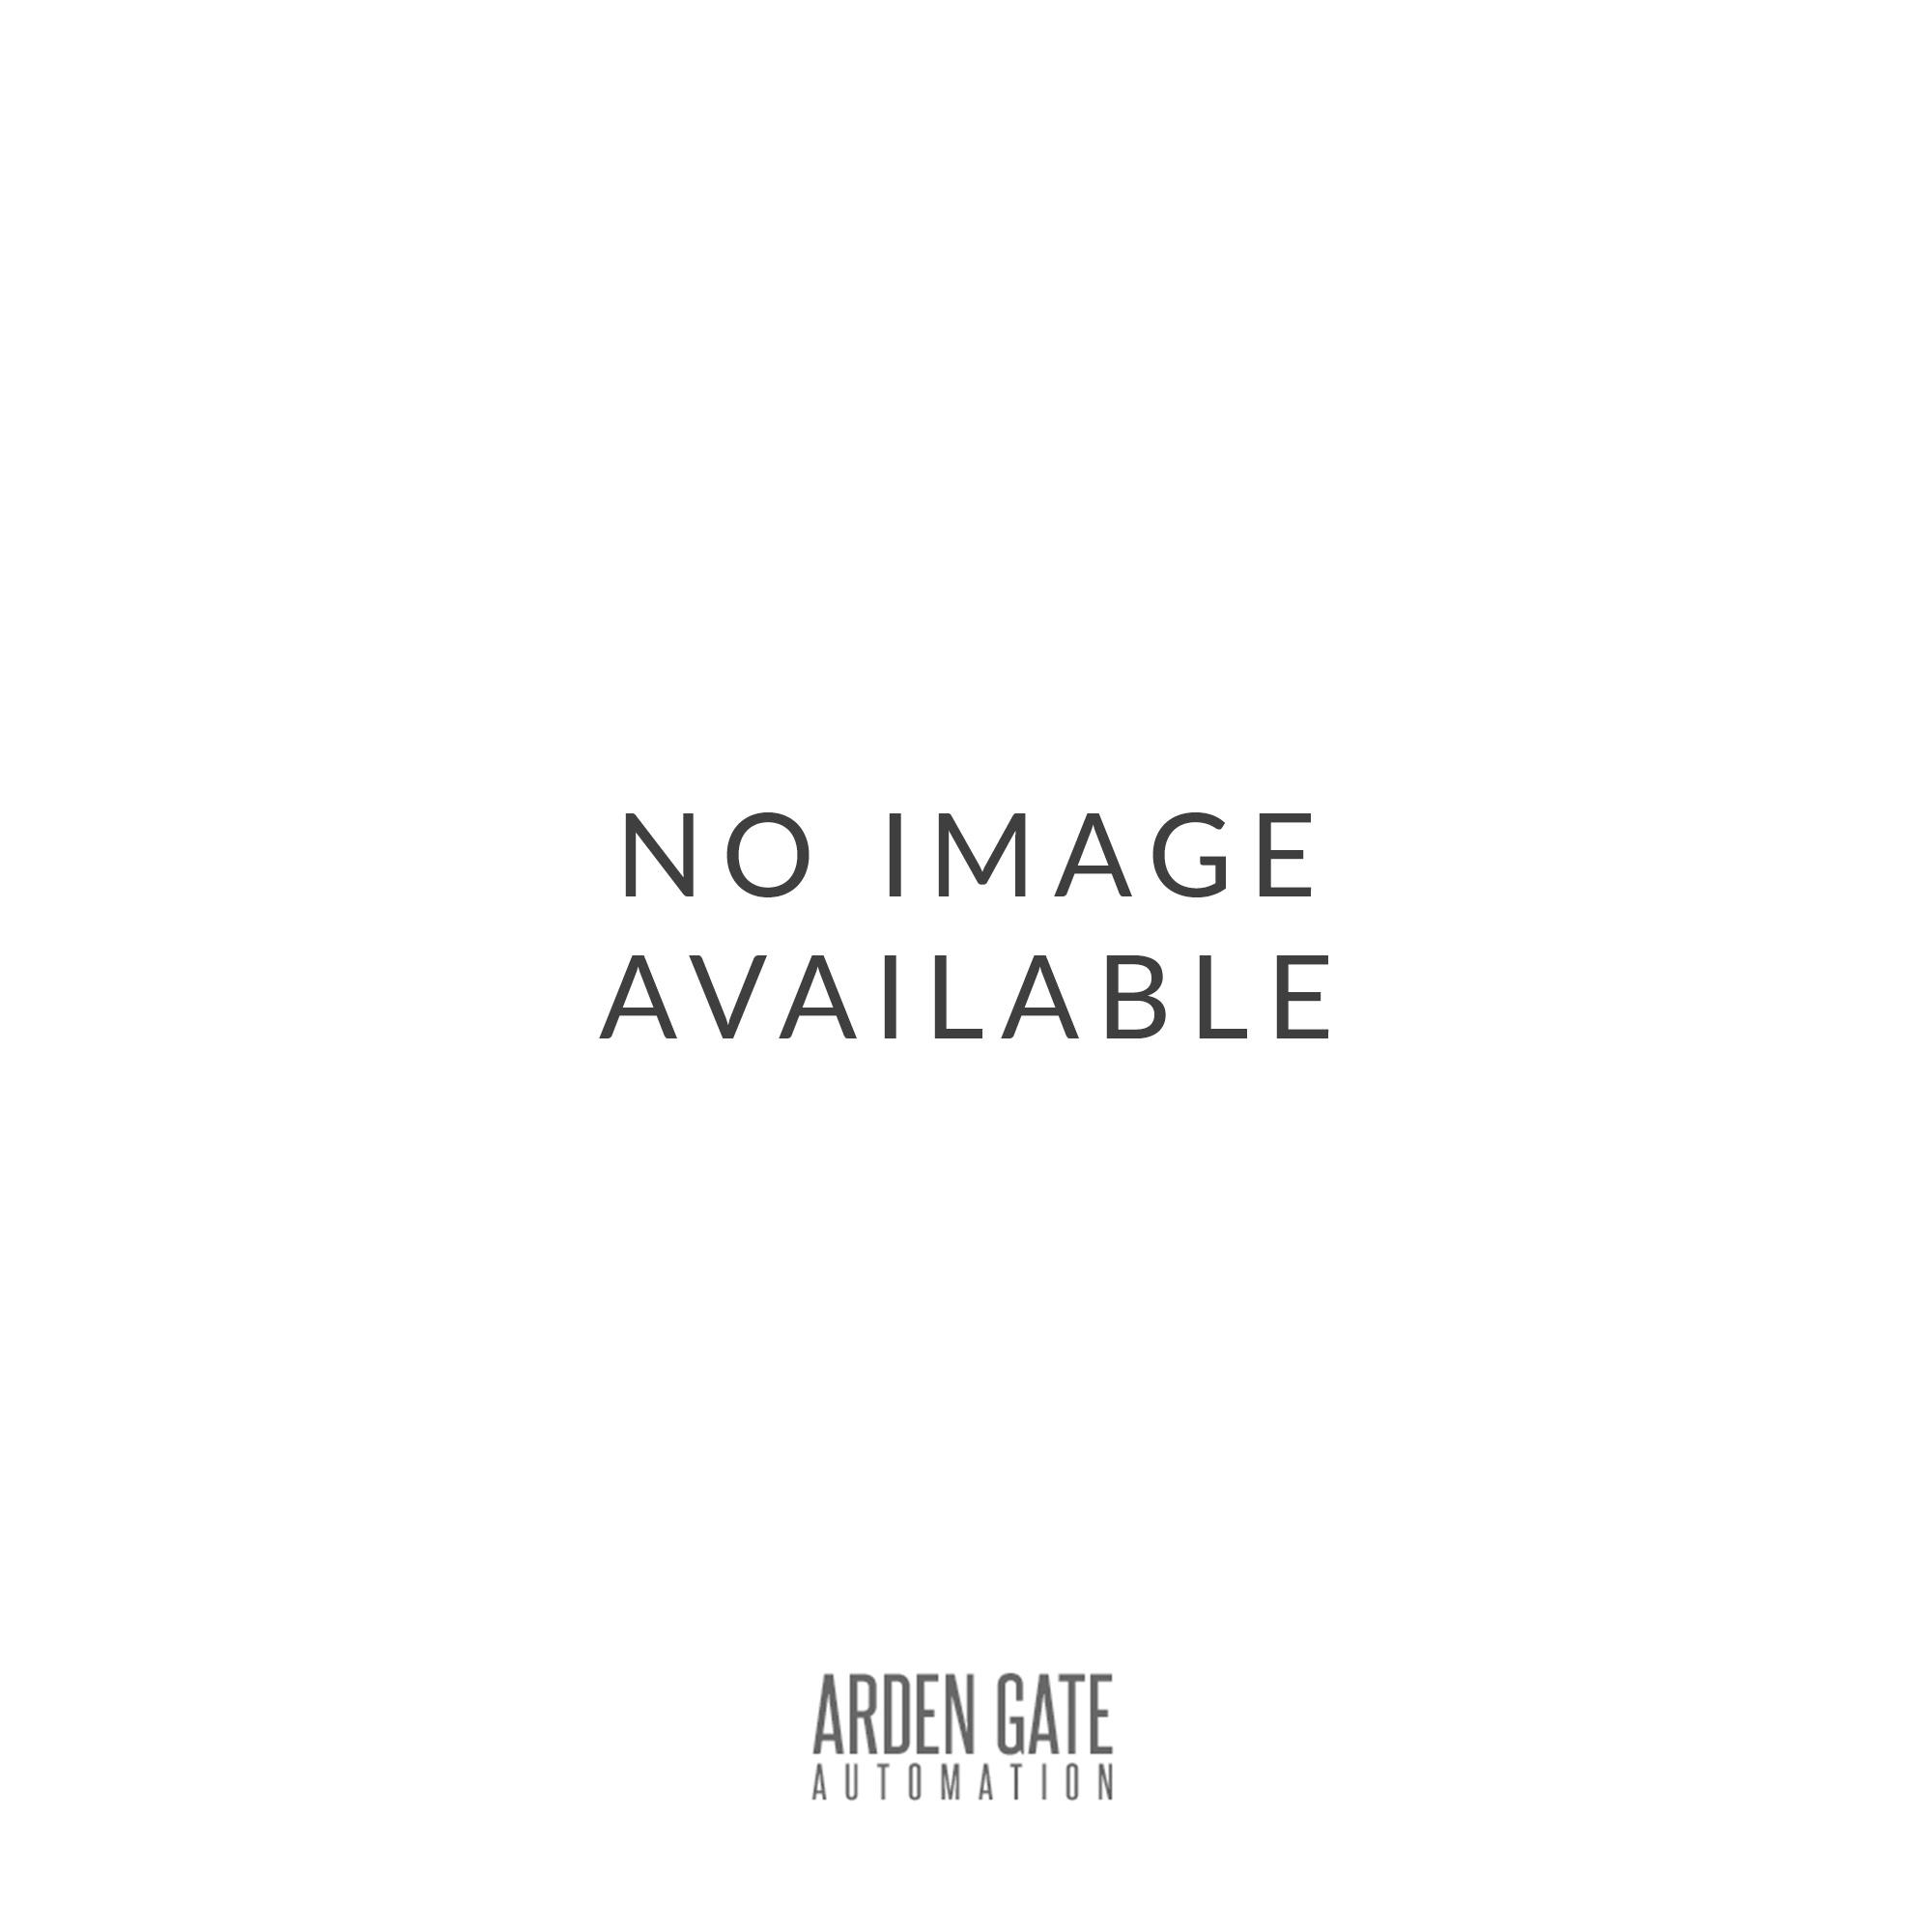 Kit R20/310/S 230v single operator kit